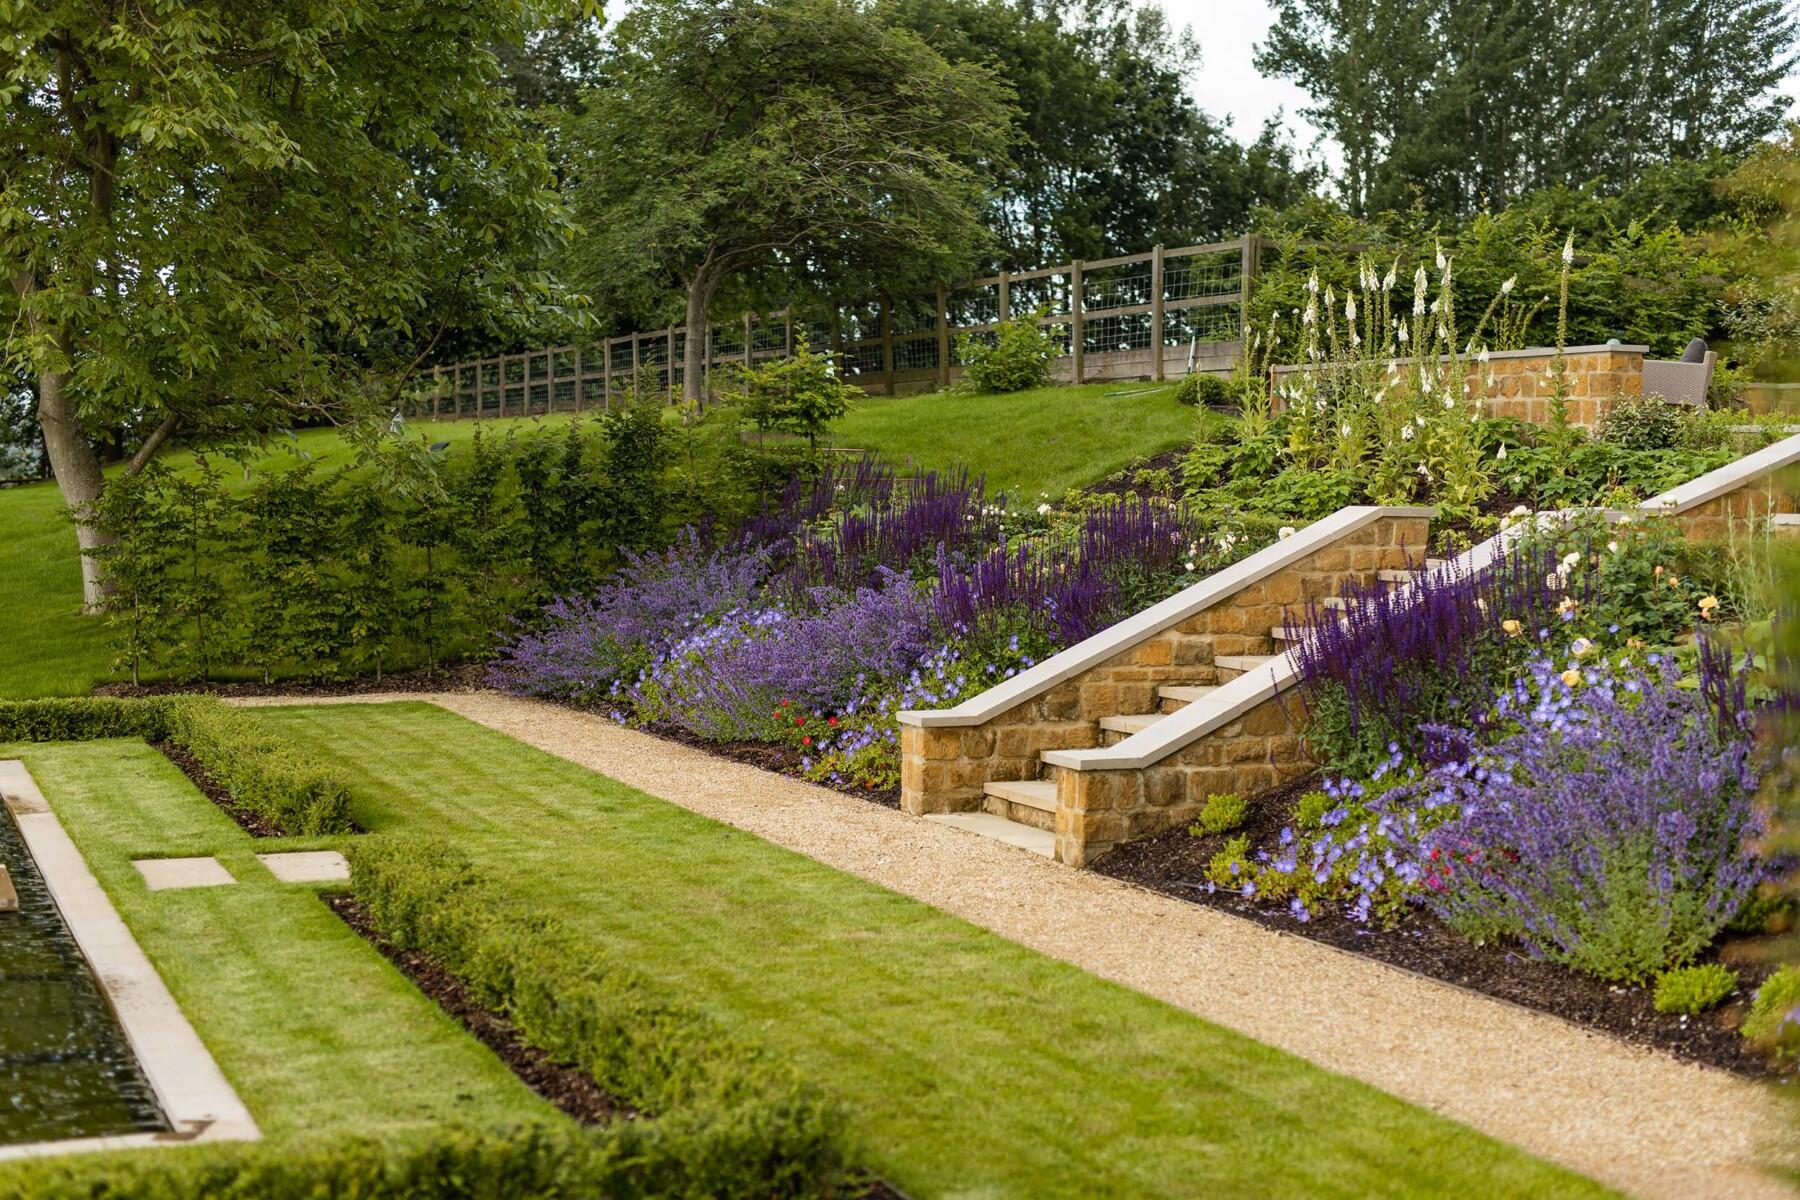 Nicholsons Garden - Lockdown For The Grandchildren 4